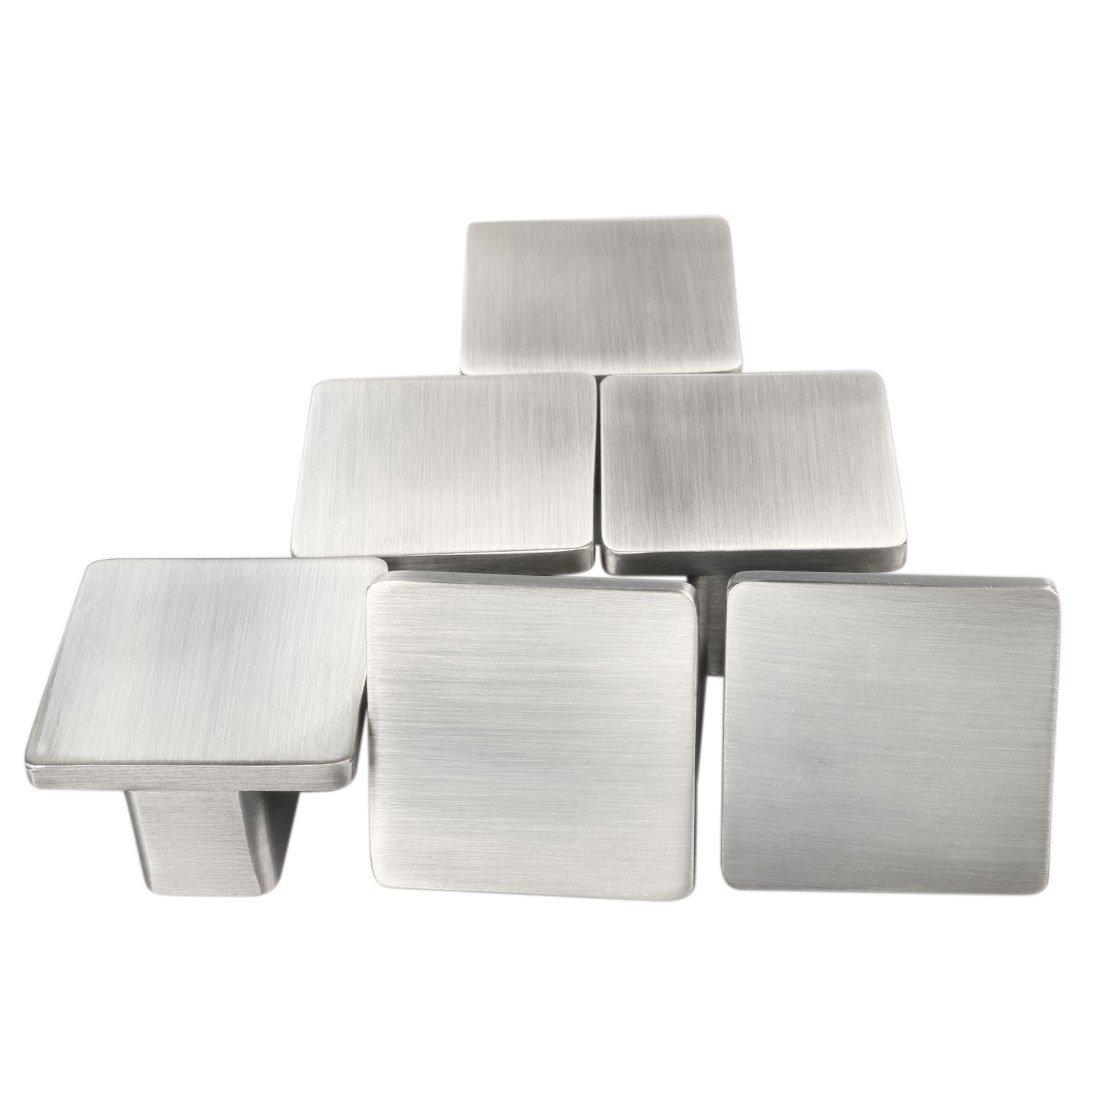 uxcell Set of 6 Modern Silver Metal Satin Finish Knob Furniture Door Cabinet Hardware Wardrobe Drawer Pull Handles Square Knobs #2